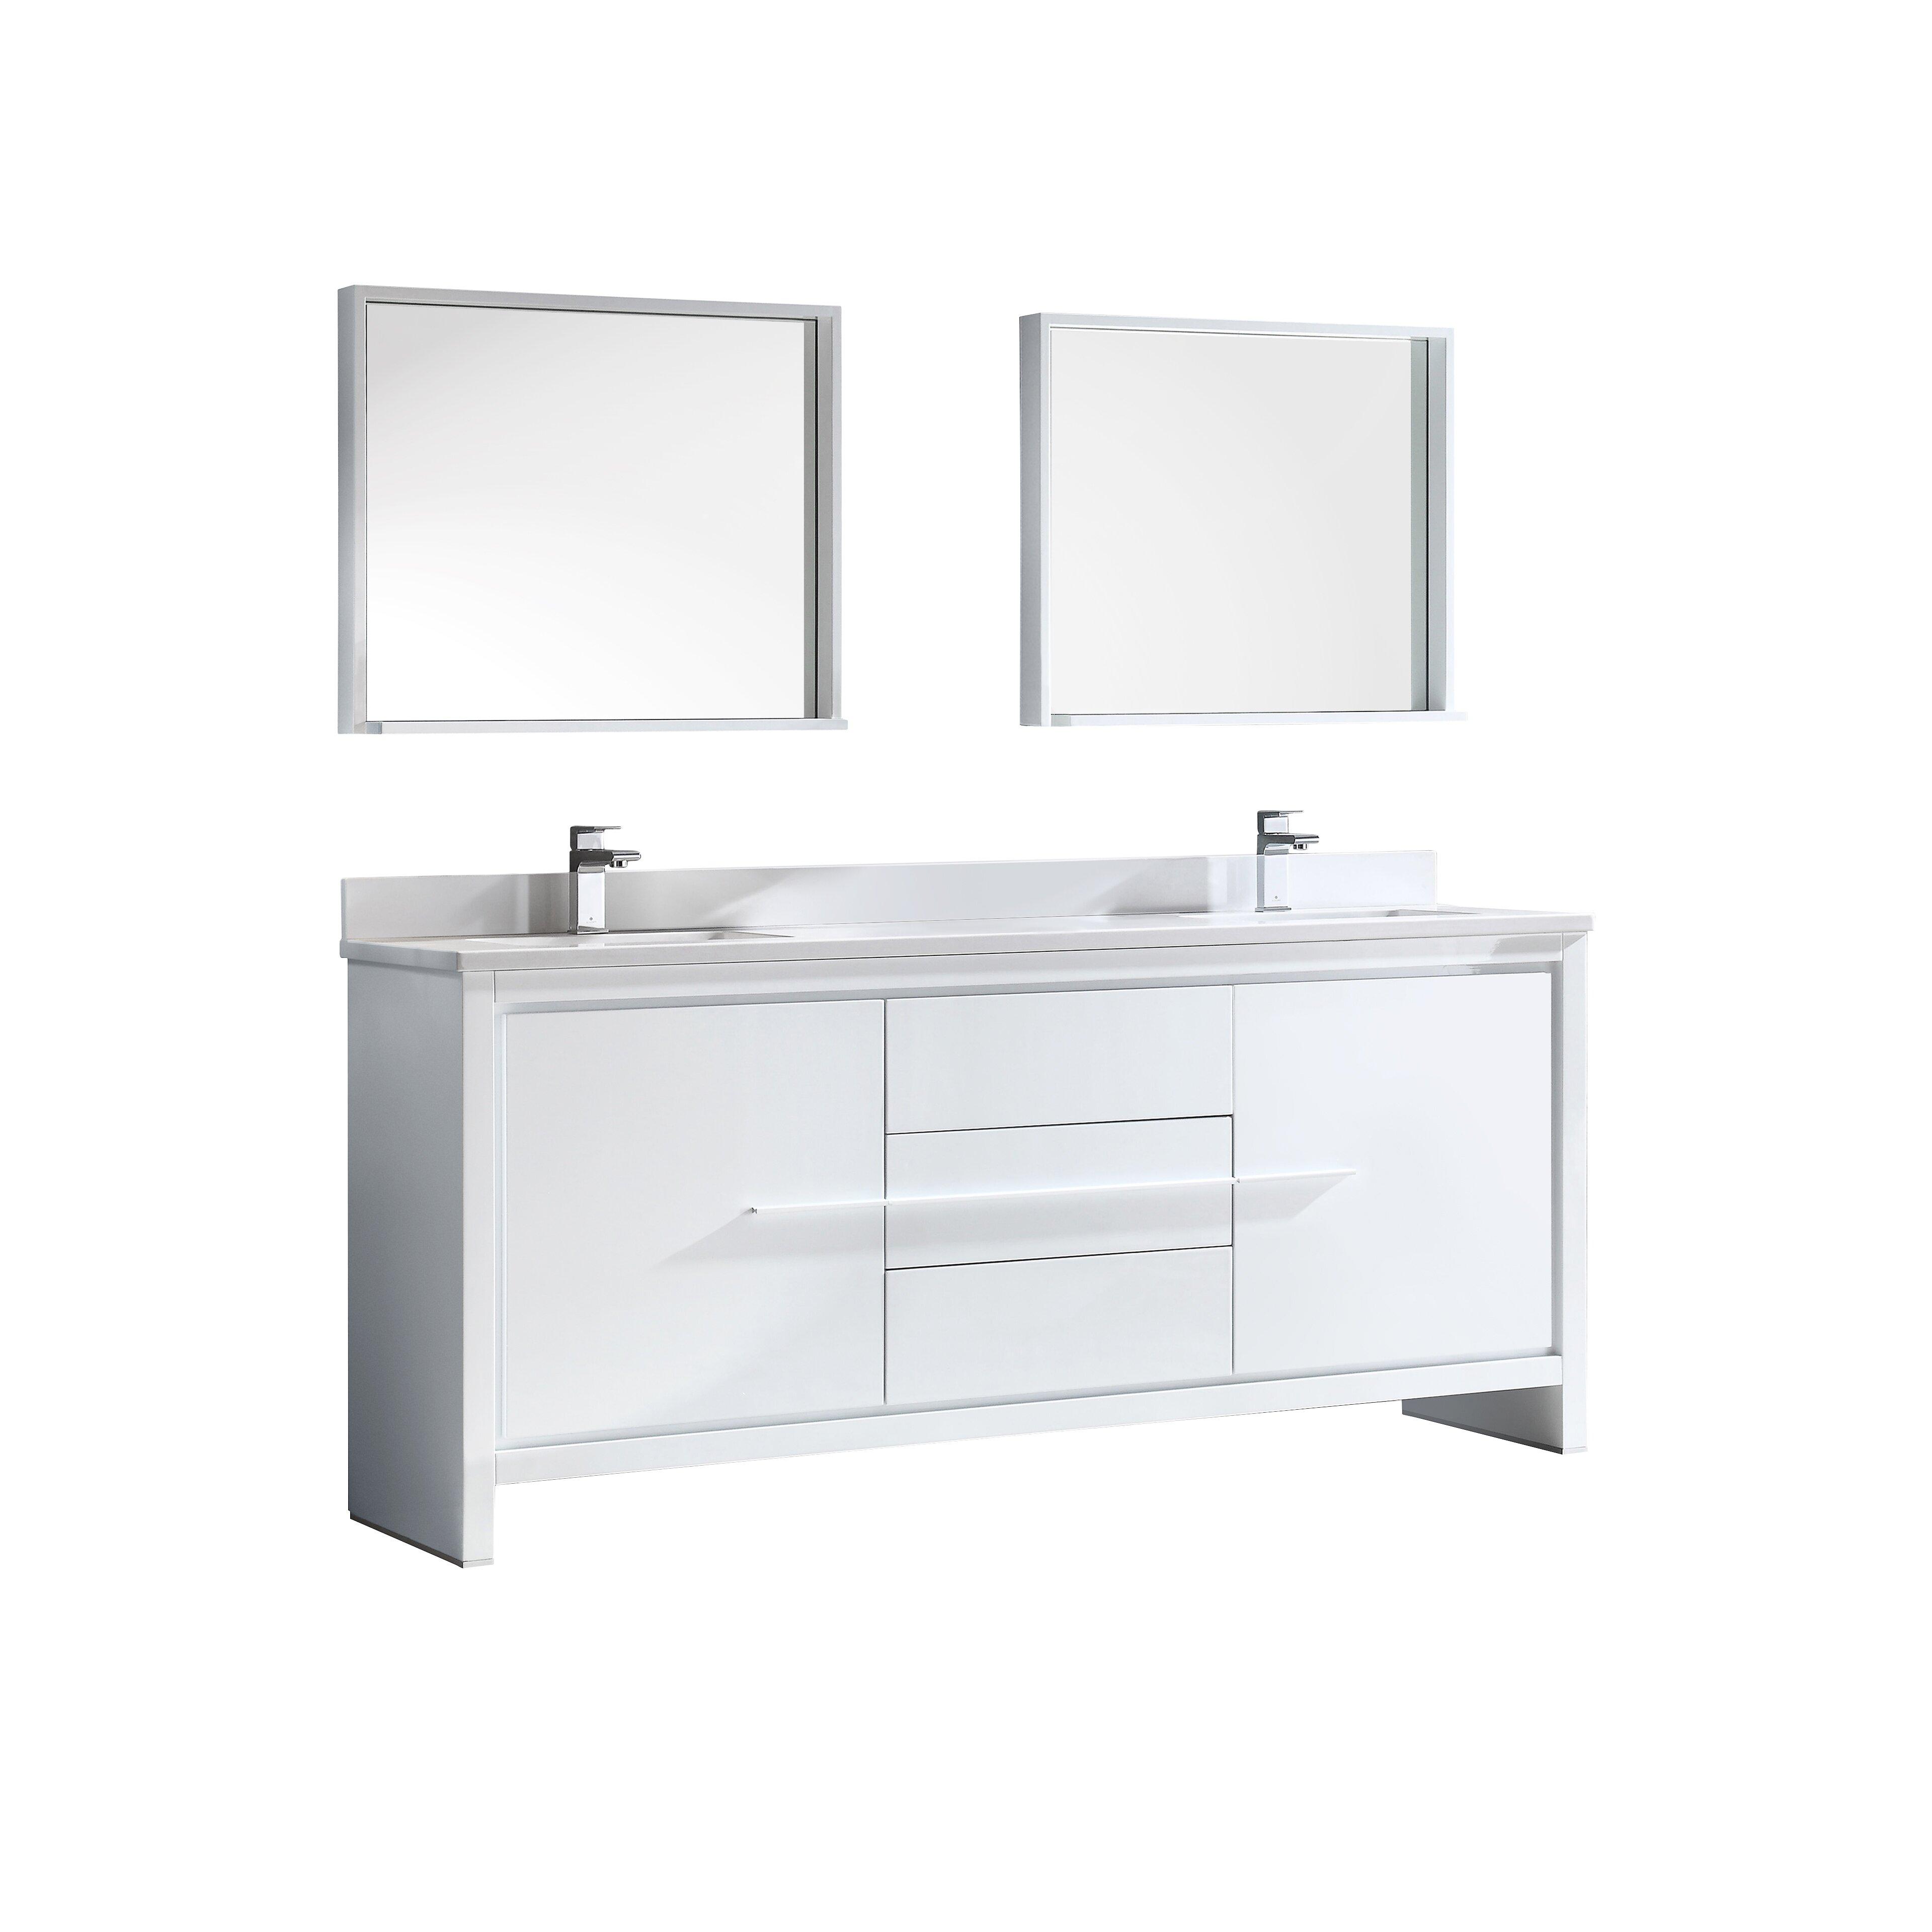 "Fresca Trieste Allier 72"" Double Modern Sink Bathroom Vanity Set with Mi"